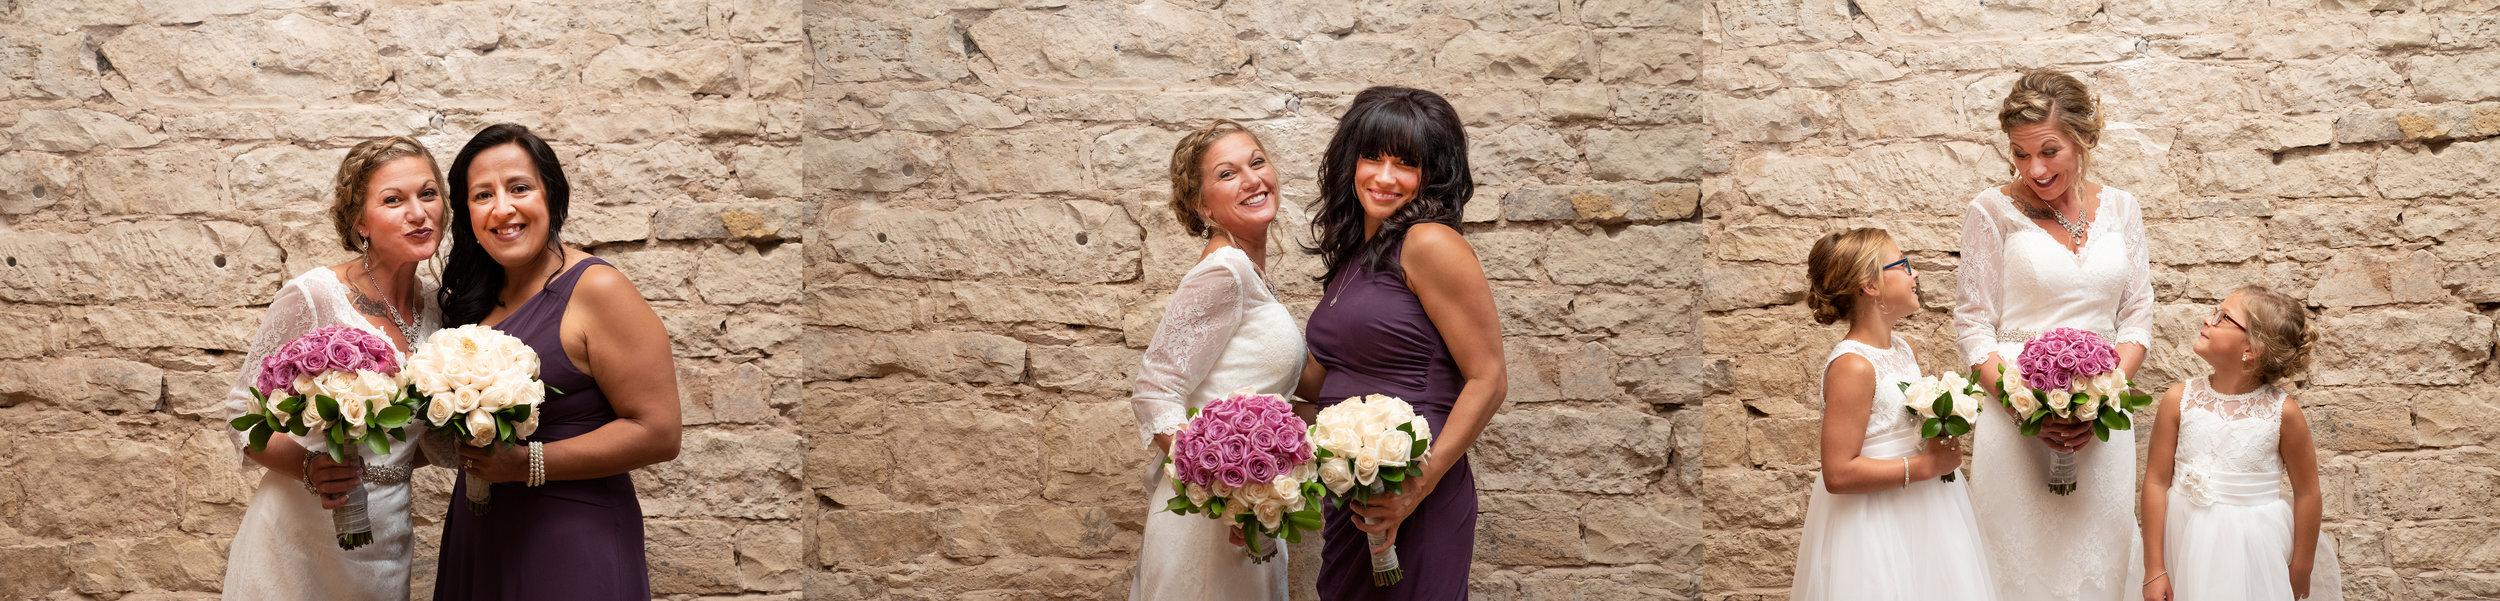 Bridesmaids02.jpg